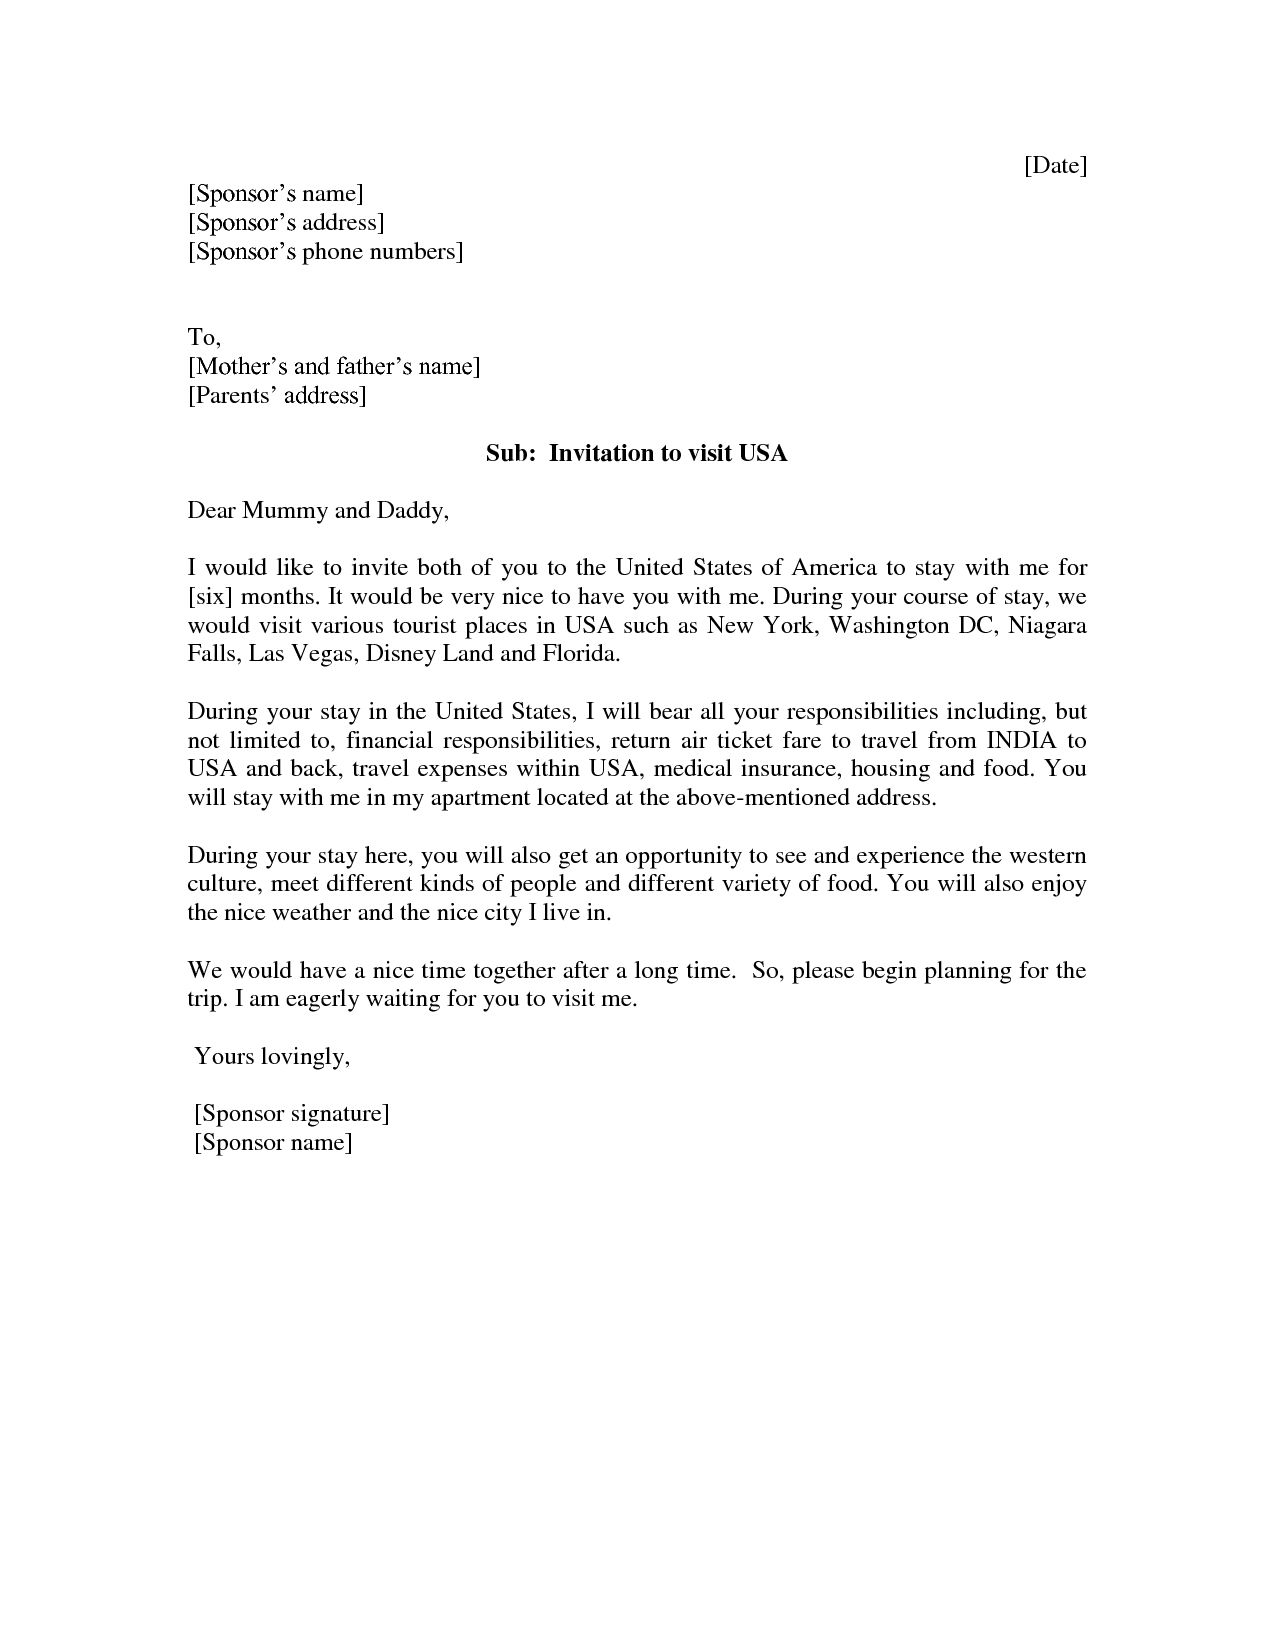 How To Write A Visa Invitation Letter For B2 Visa Vision